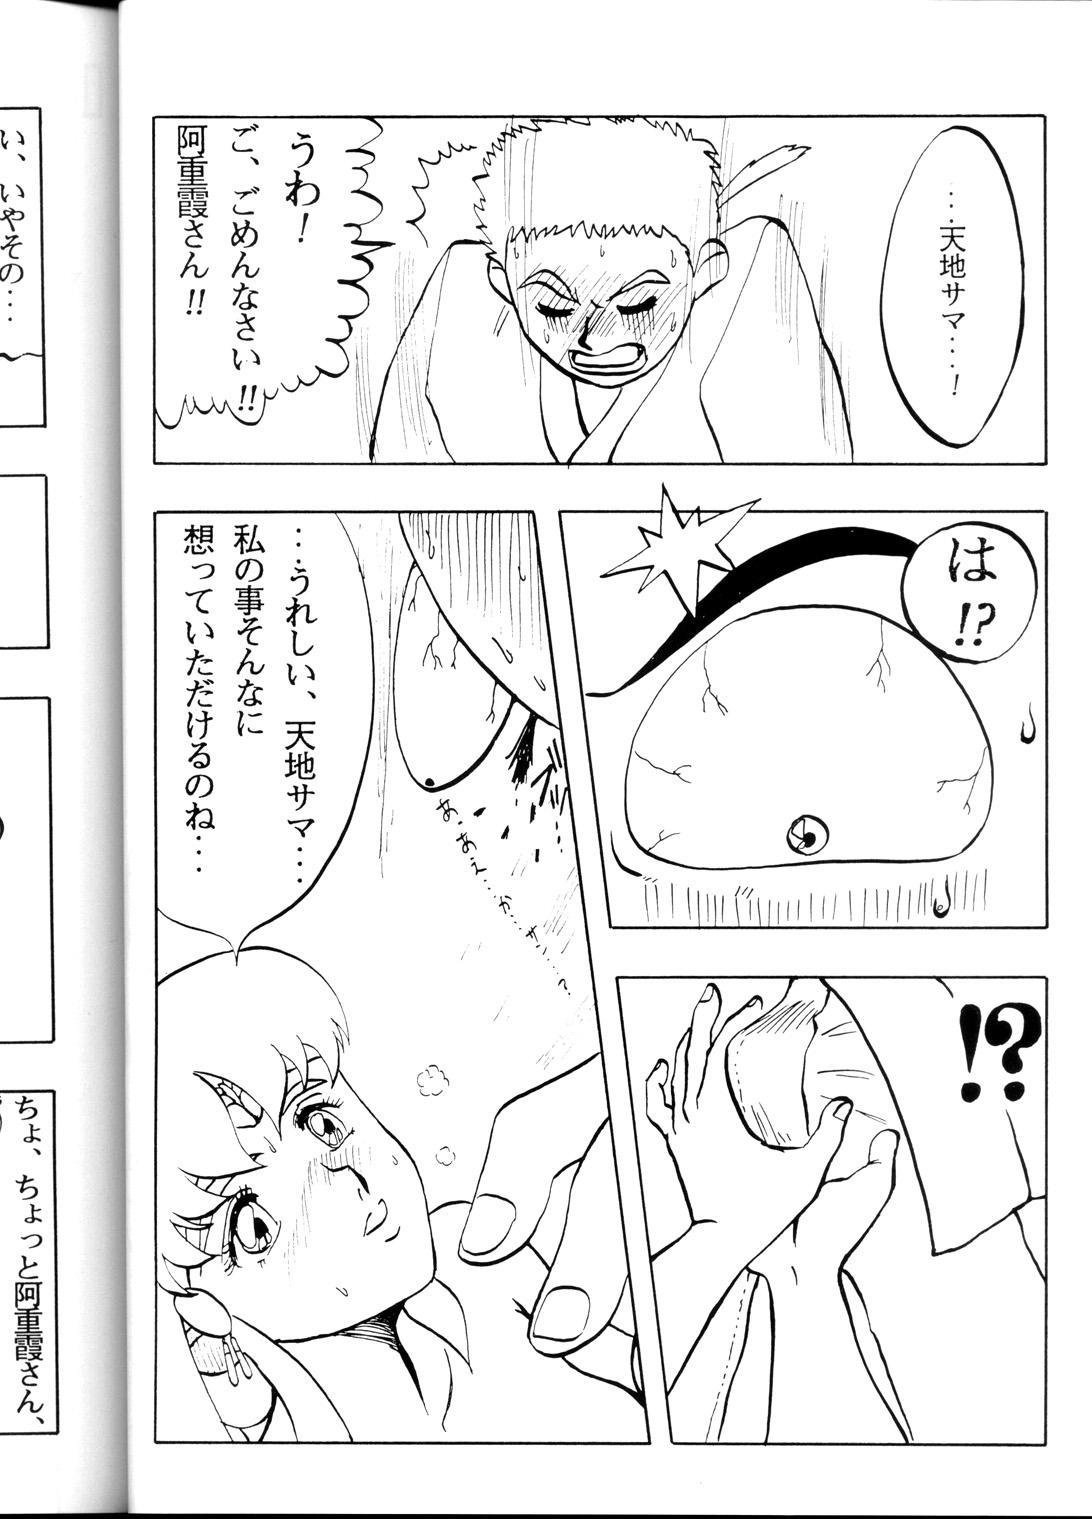 [B.B.C] Tenchi Muyou! Ryou-ou-ki Kaiteiben (Tenchi Muyou!) 42